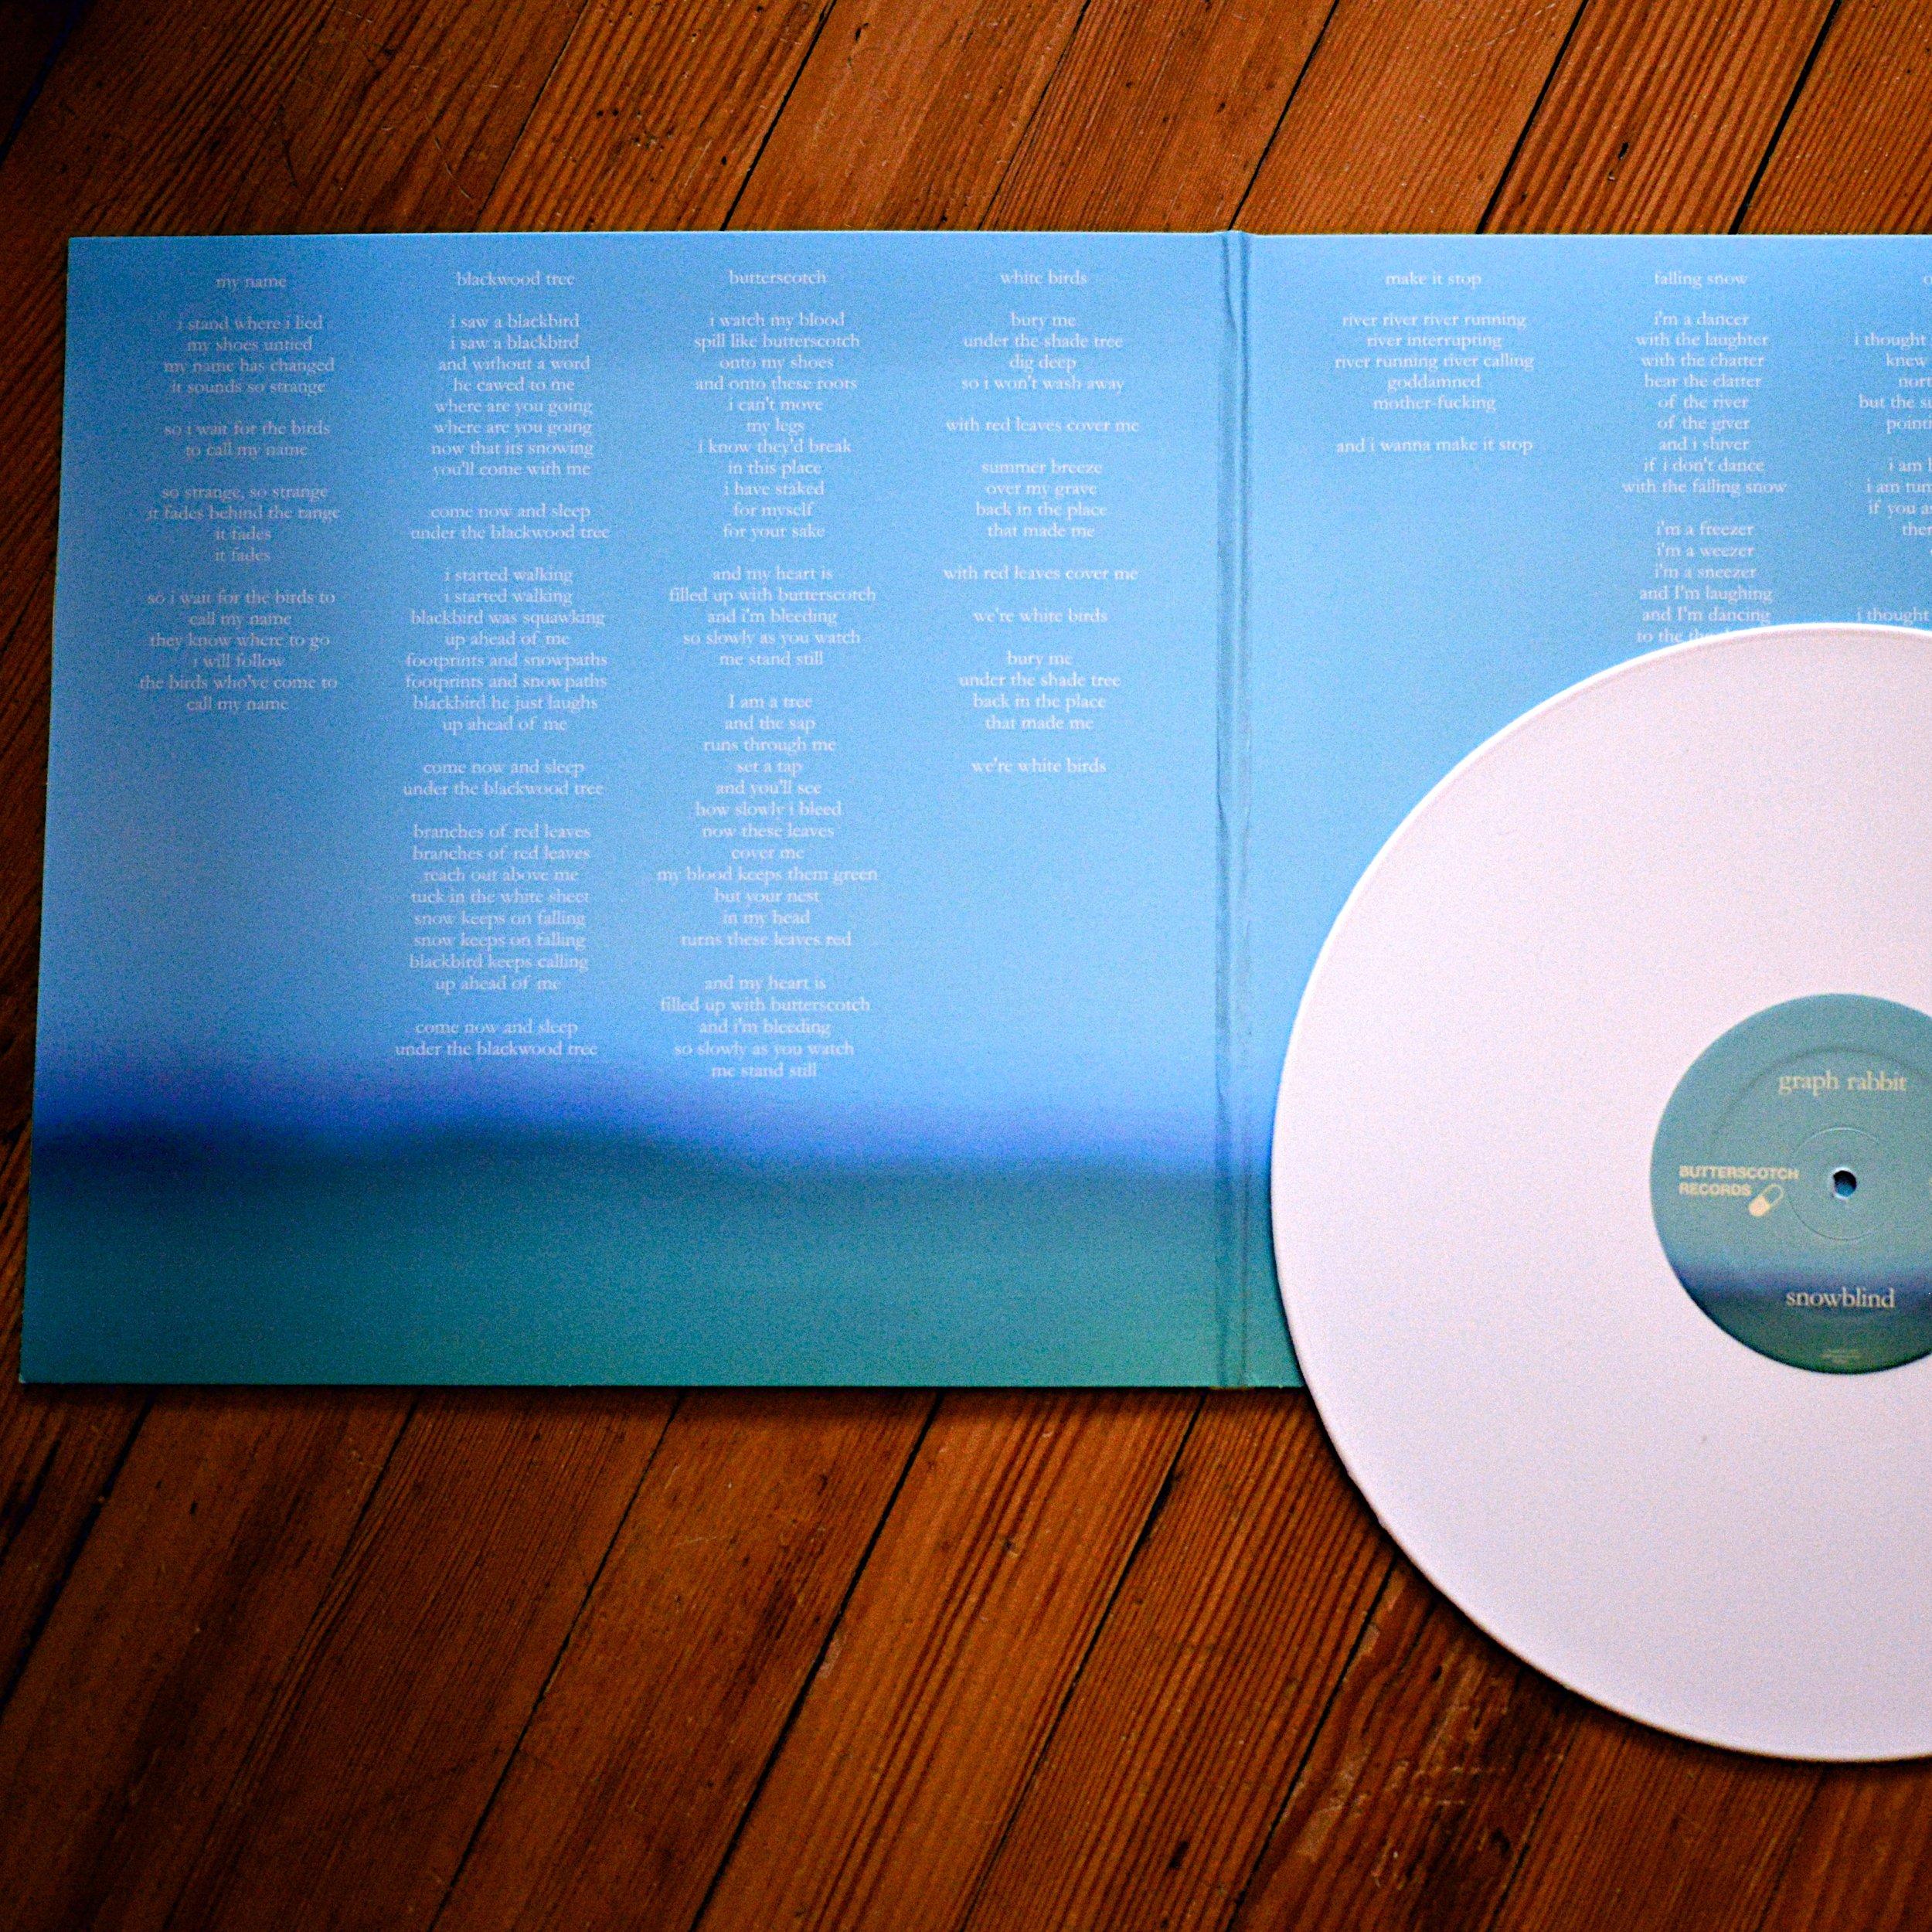 Snowblind_Vinyl6 (1).jpg